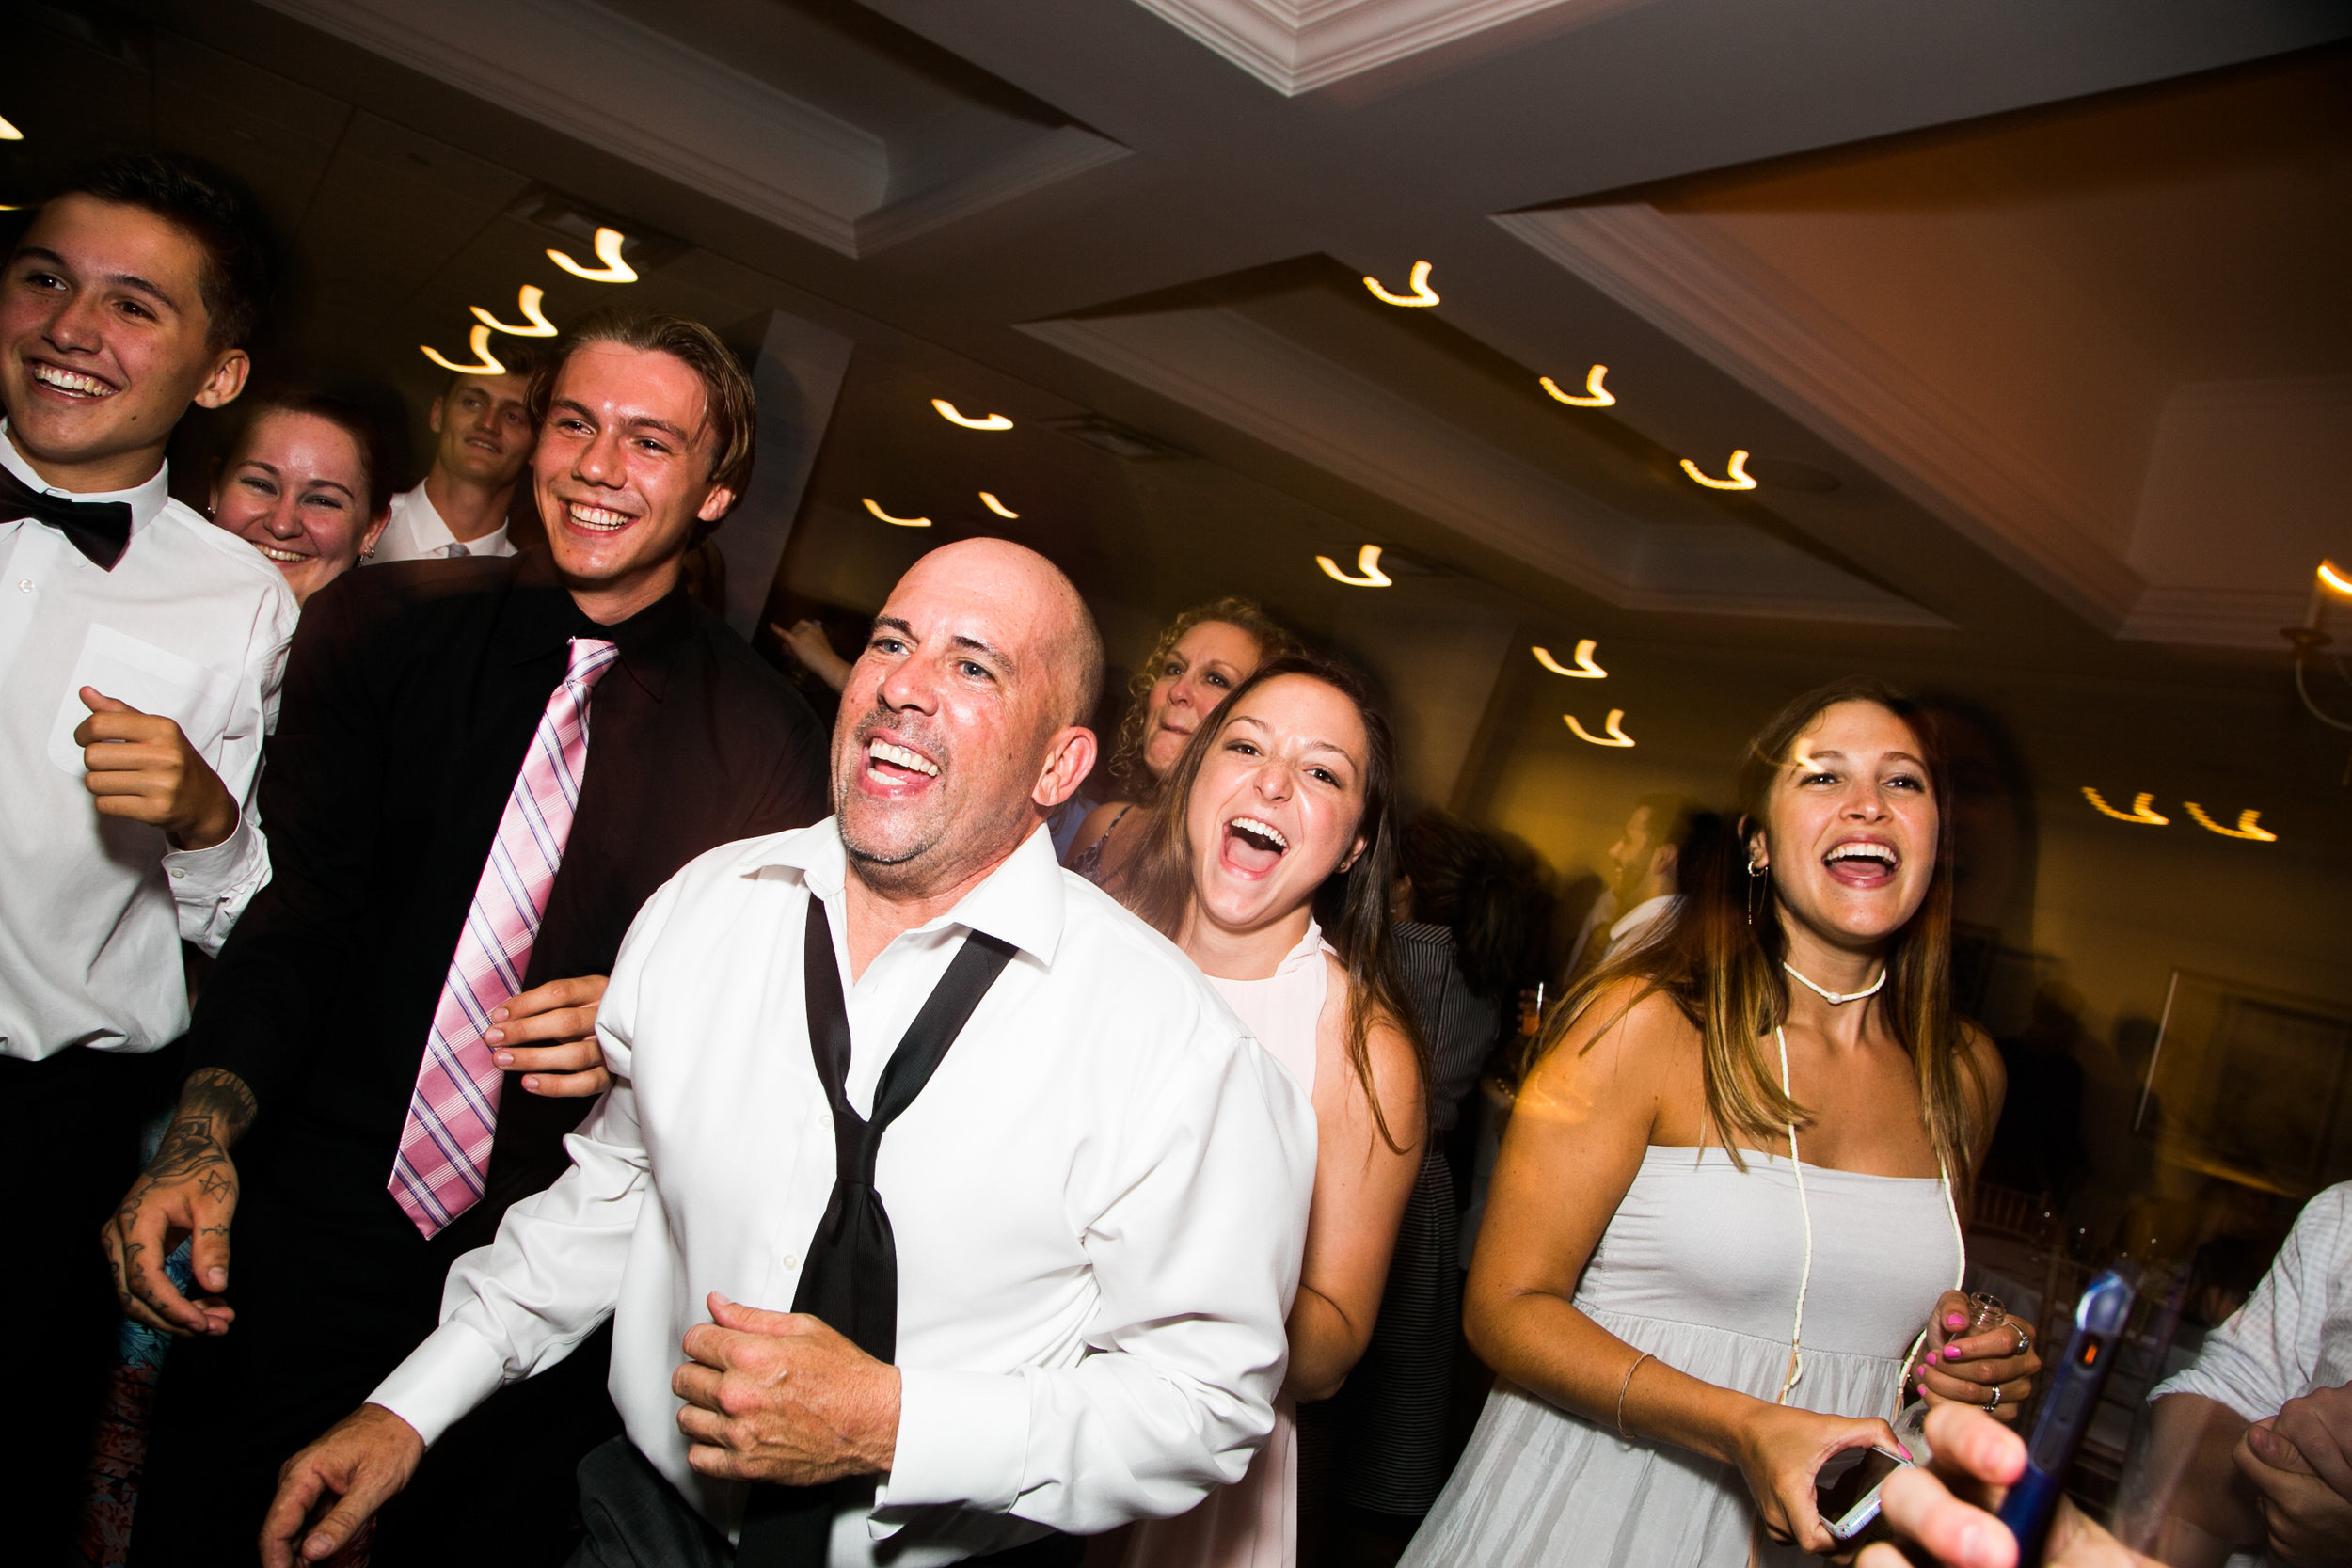 ICONA GOLDEN INN AVALON NJ WEDDING PHOTOGRAPHY  - 096.jpg